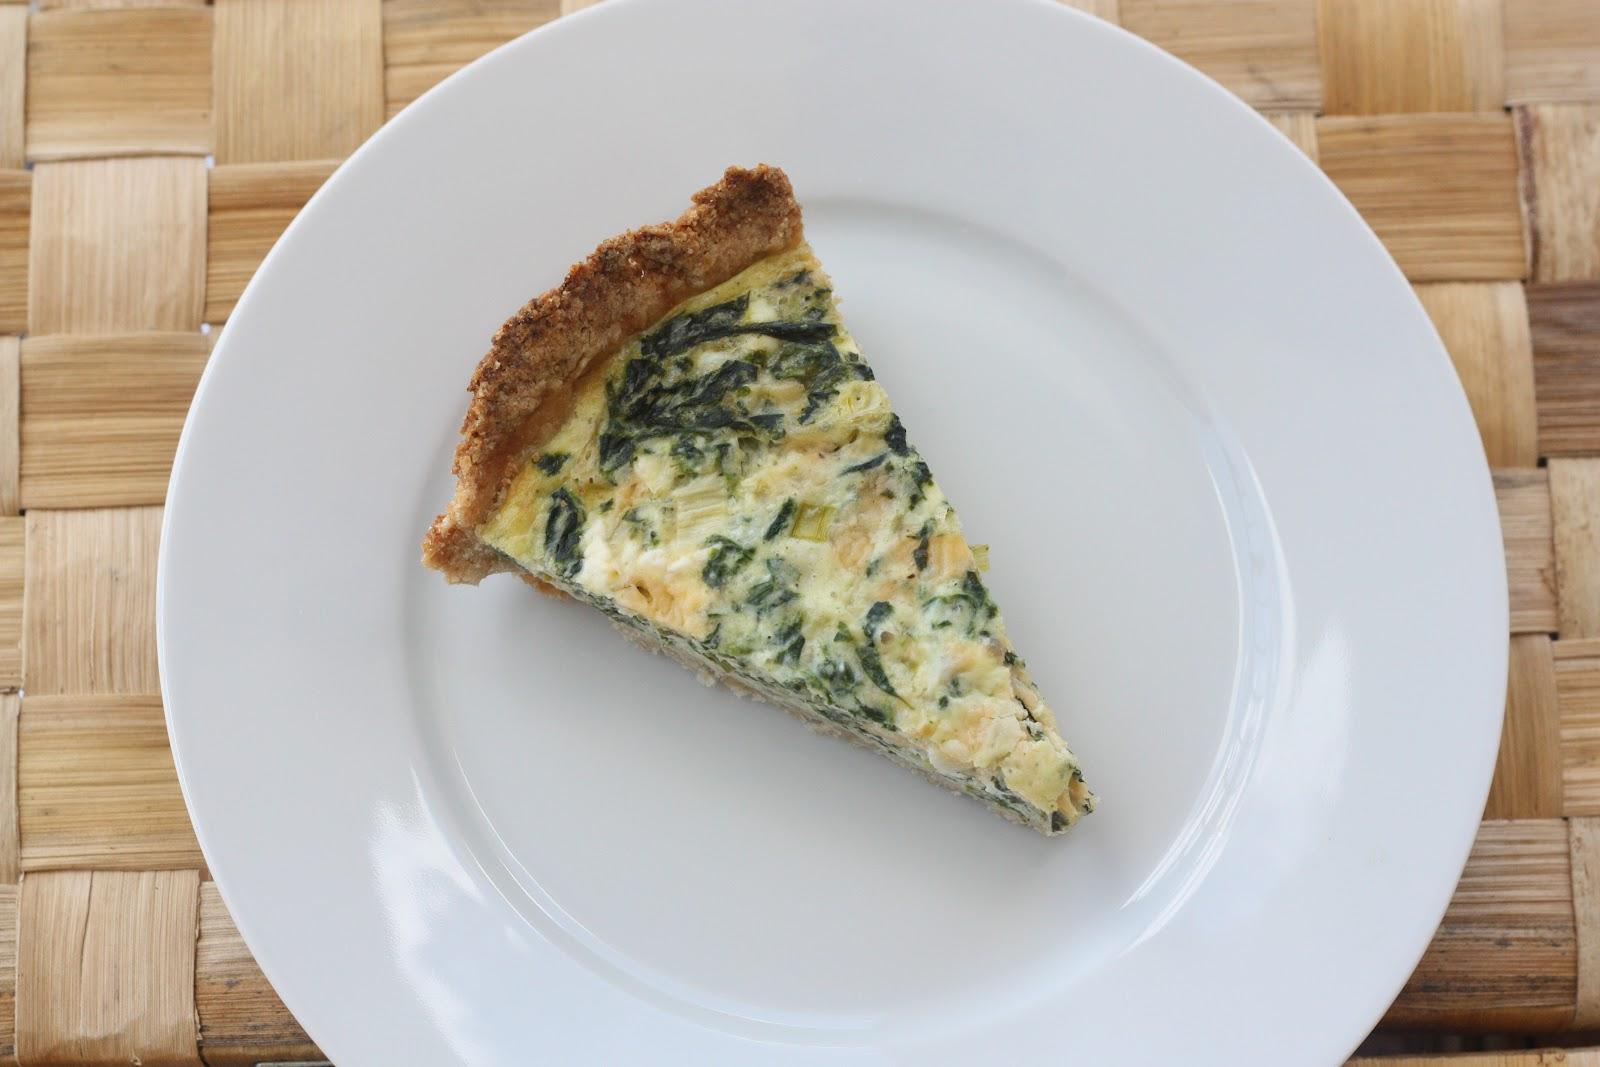 Vegetarian Recipe #15: Spinach Quiche - Everyday Reading